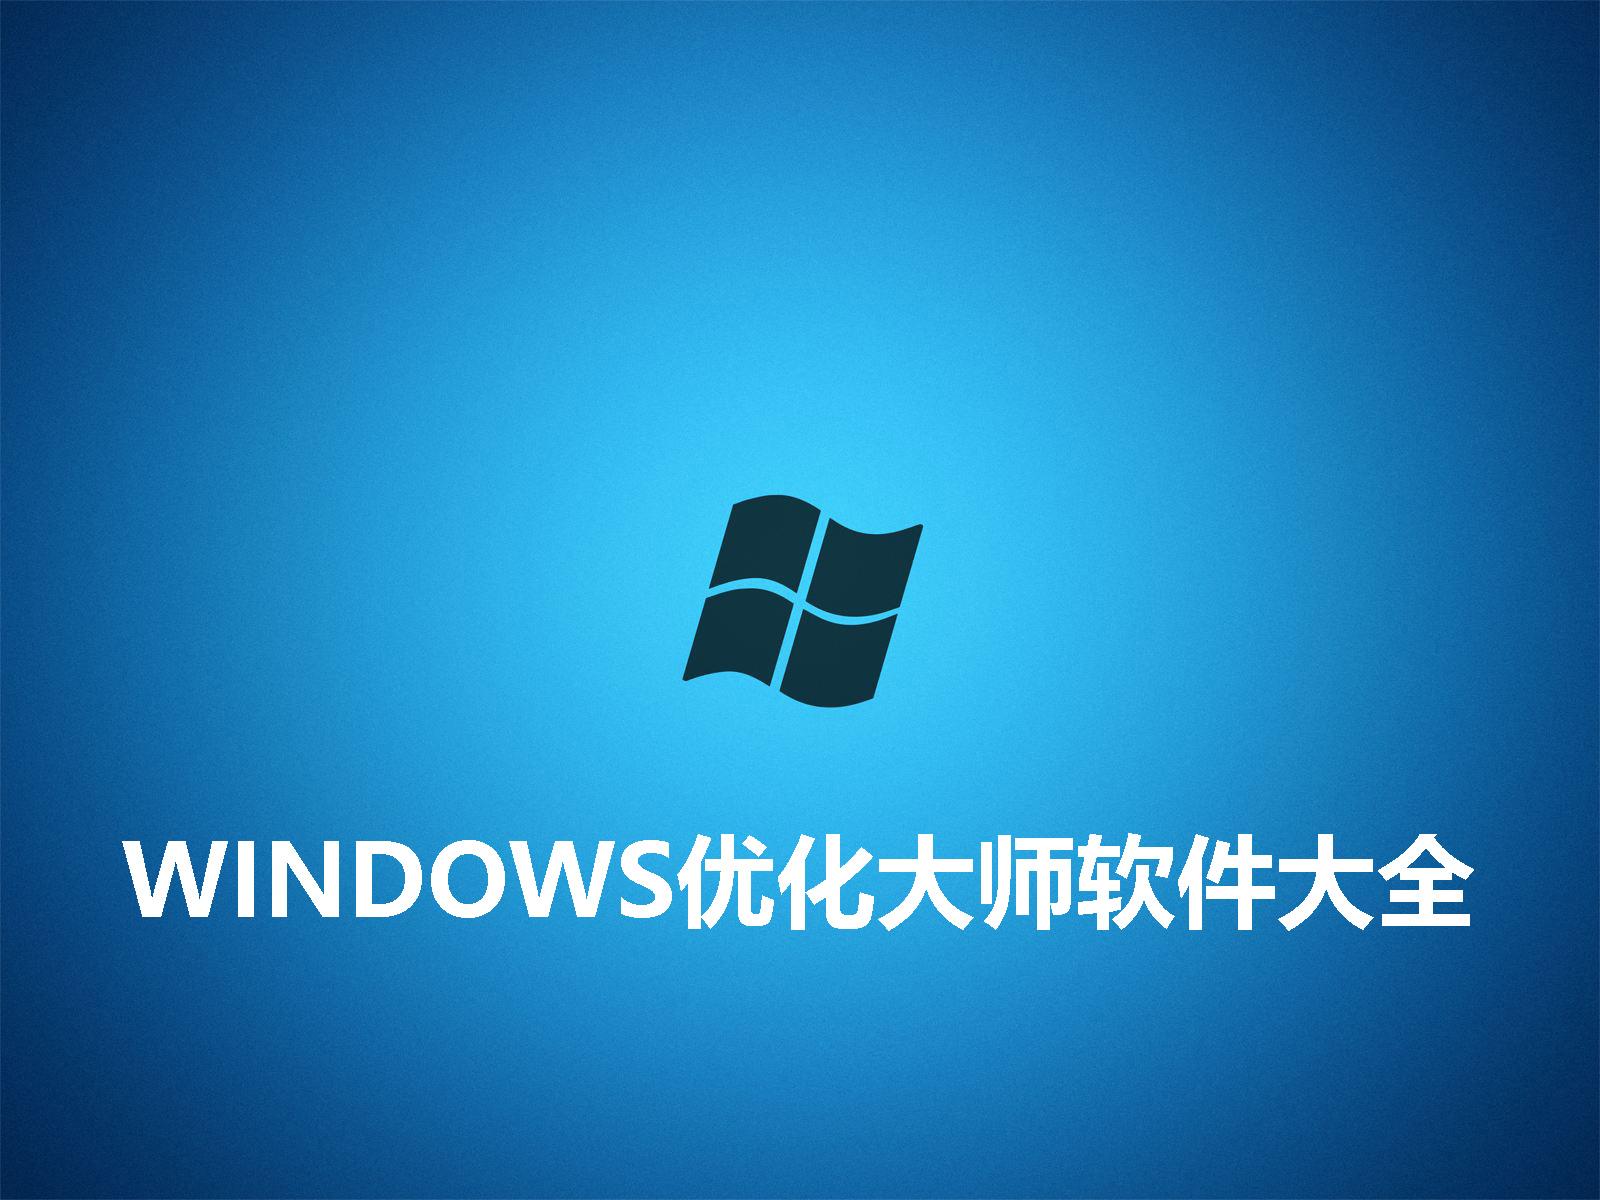 WINDOWS优化大师软件大全